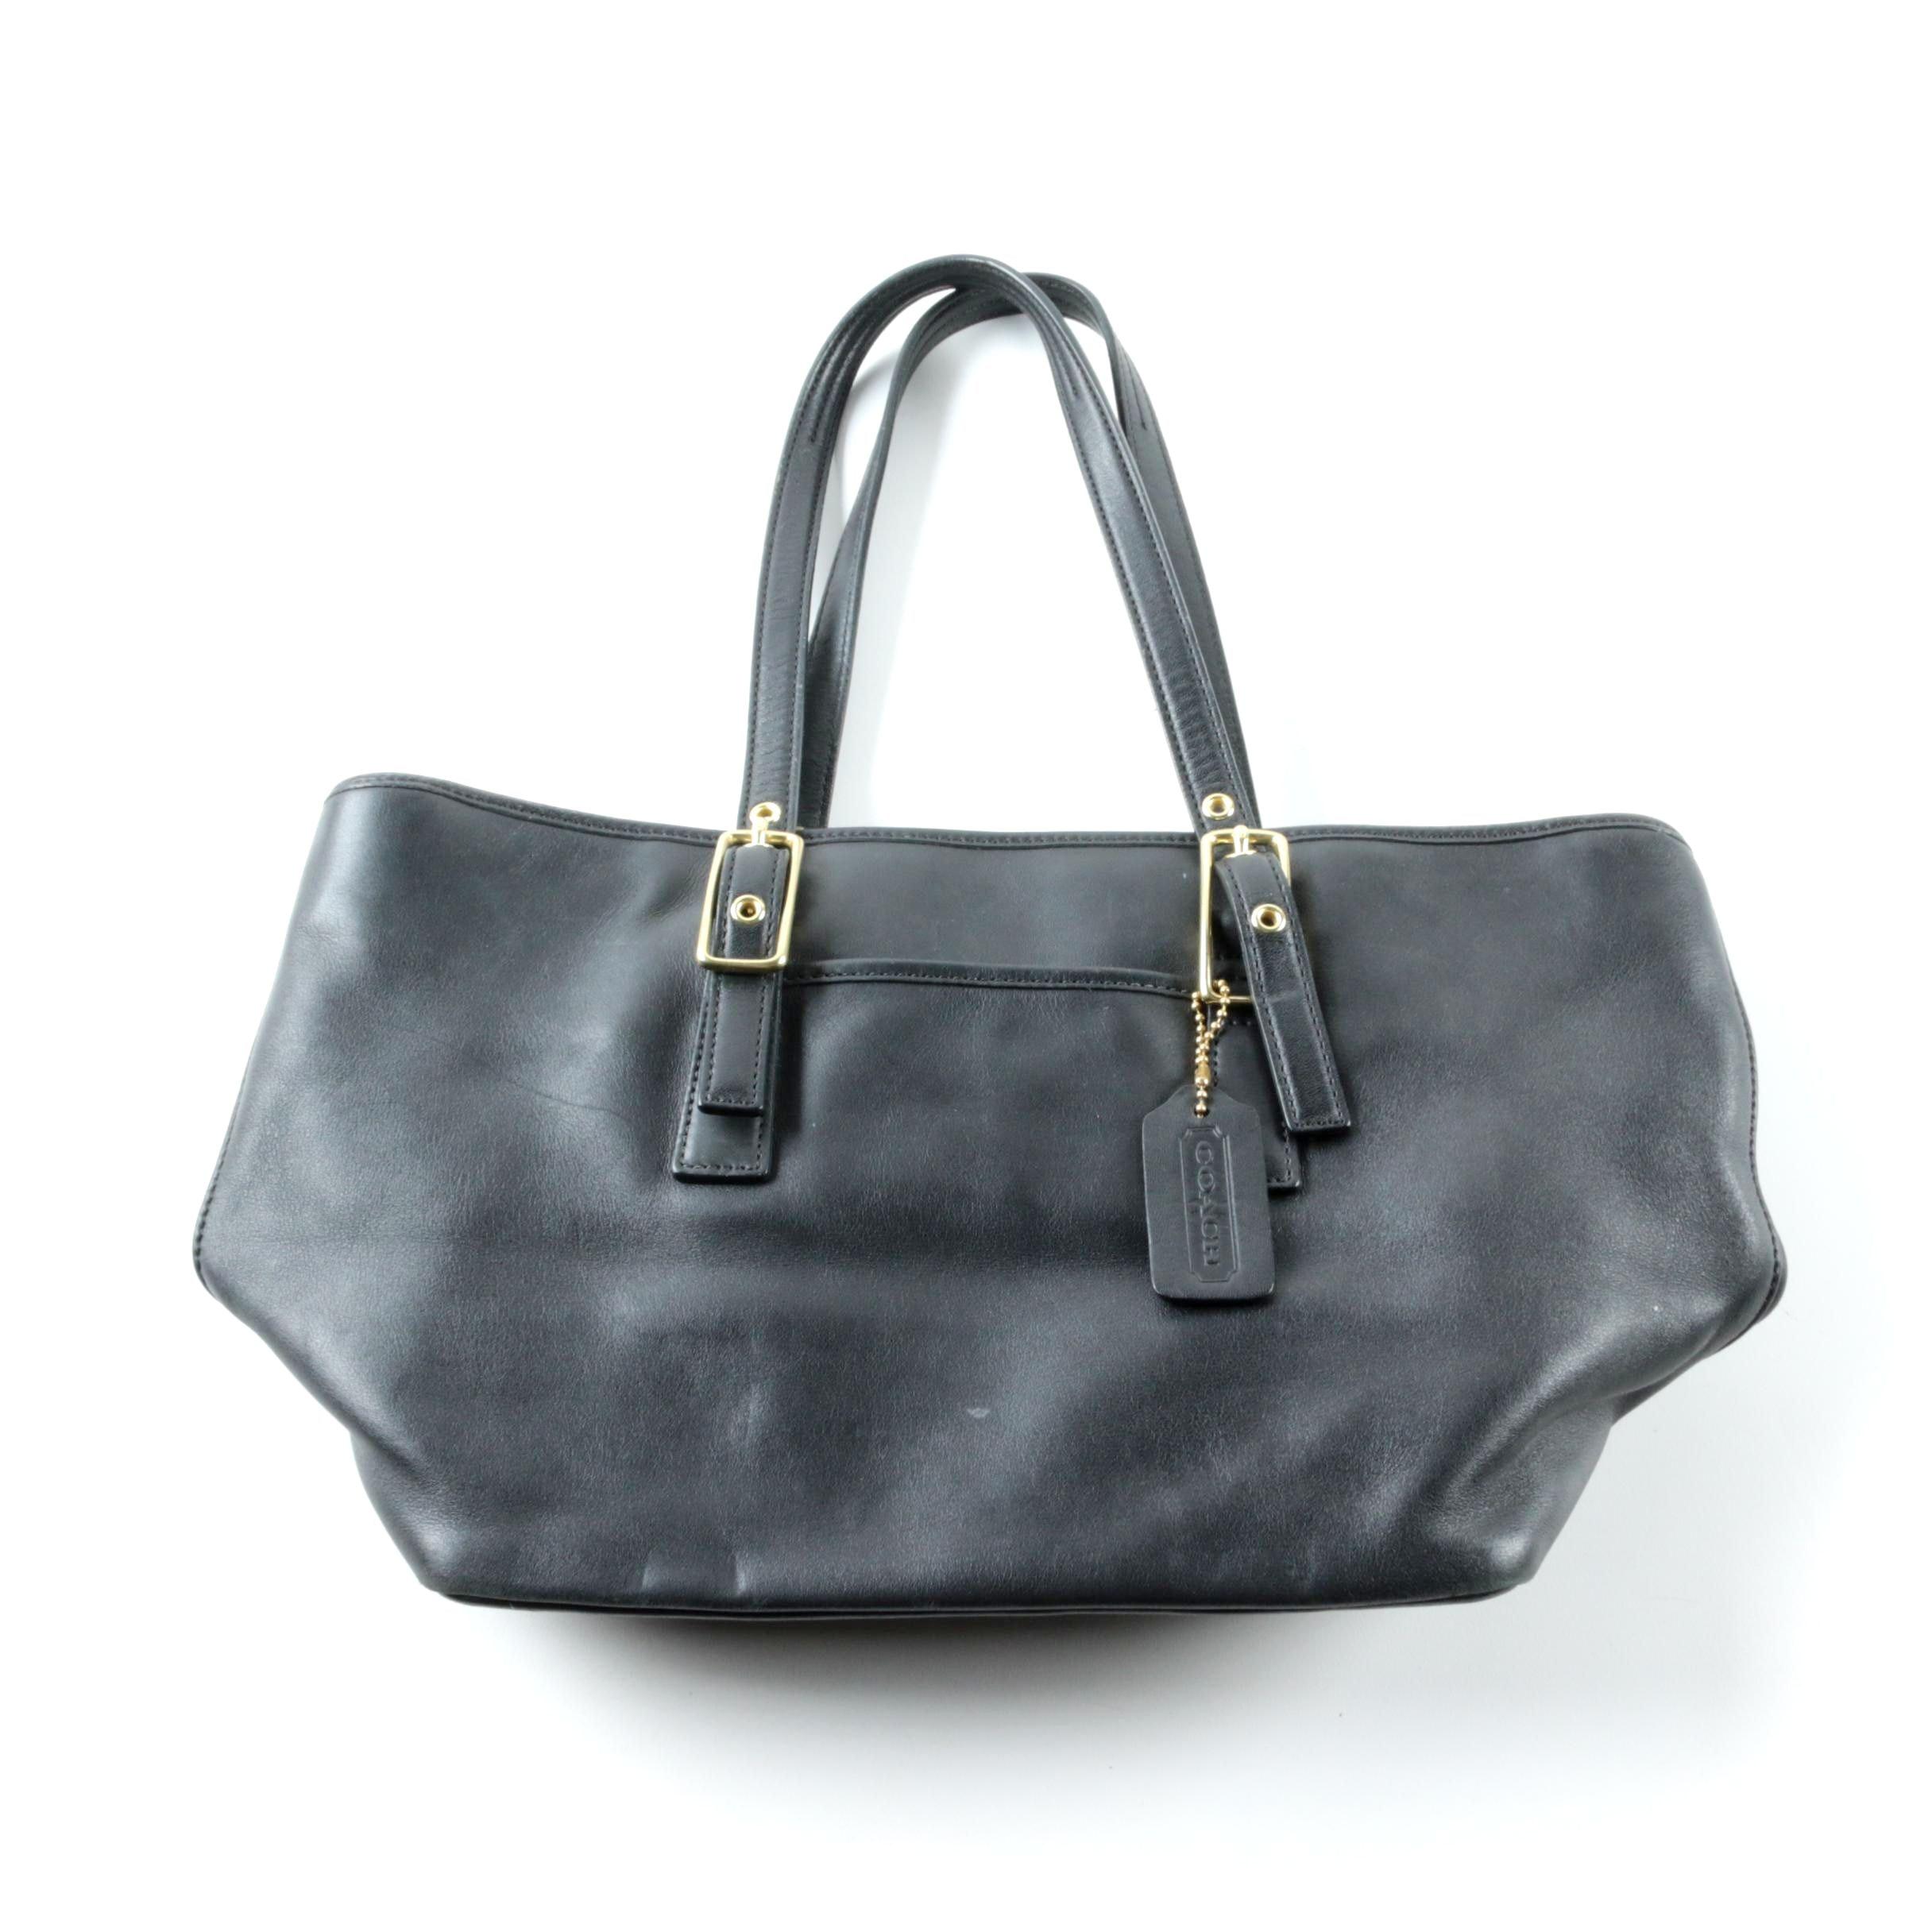 Coach Legacy Black Leather Market Tote Bag